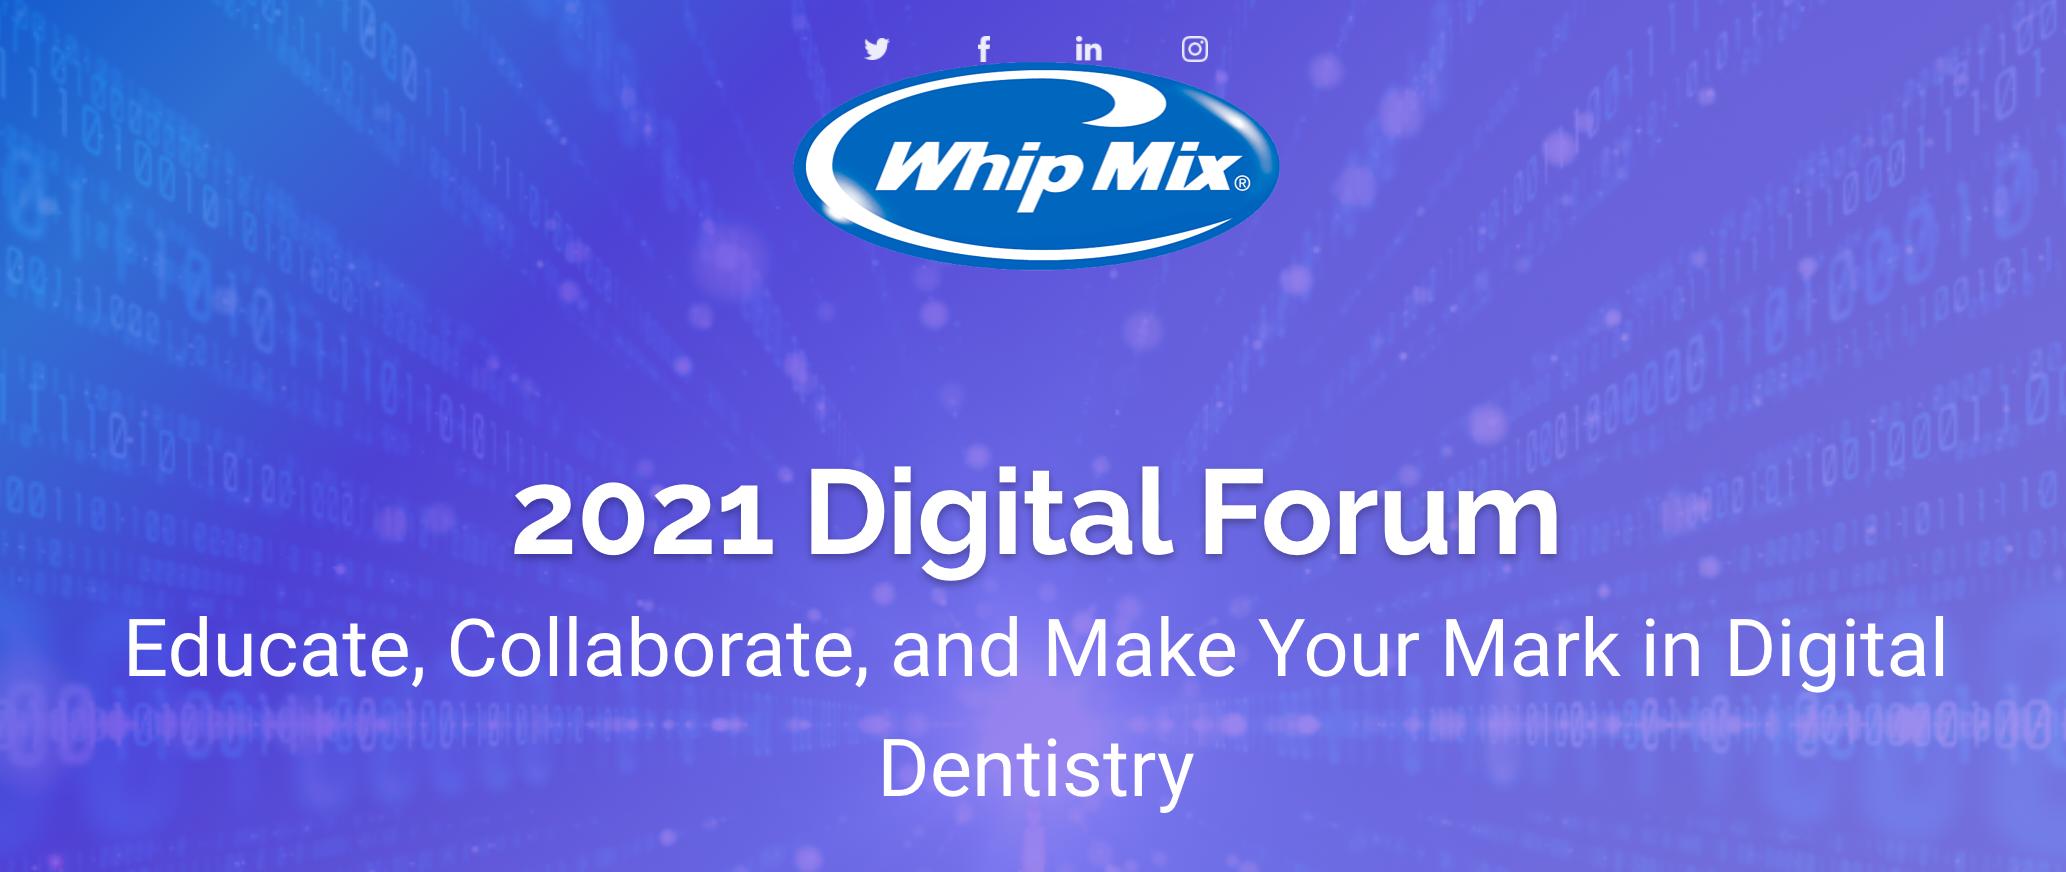 Whip Mix® 2021 Digital Forum